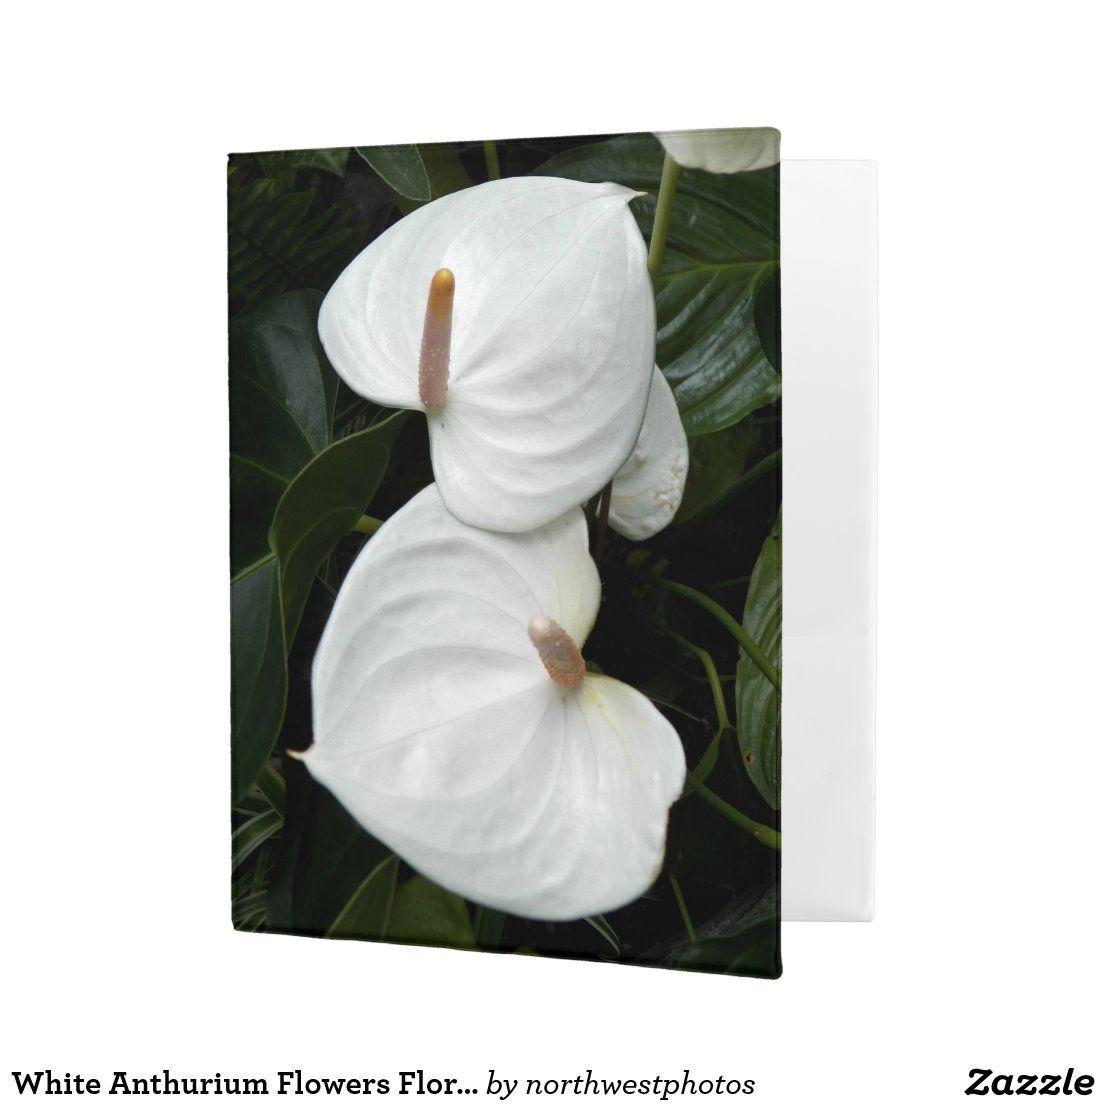 White Anthurium Flowers Floral Photo Mini Binder Zazzle Com Anthurium Flower Anthurium Floral Photography Nature